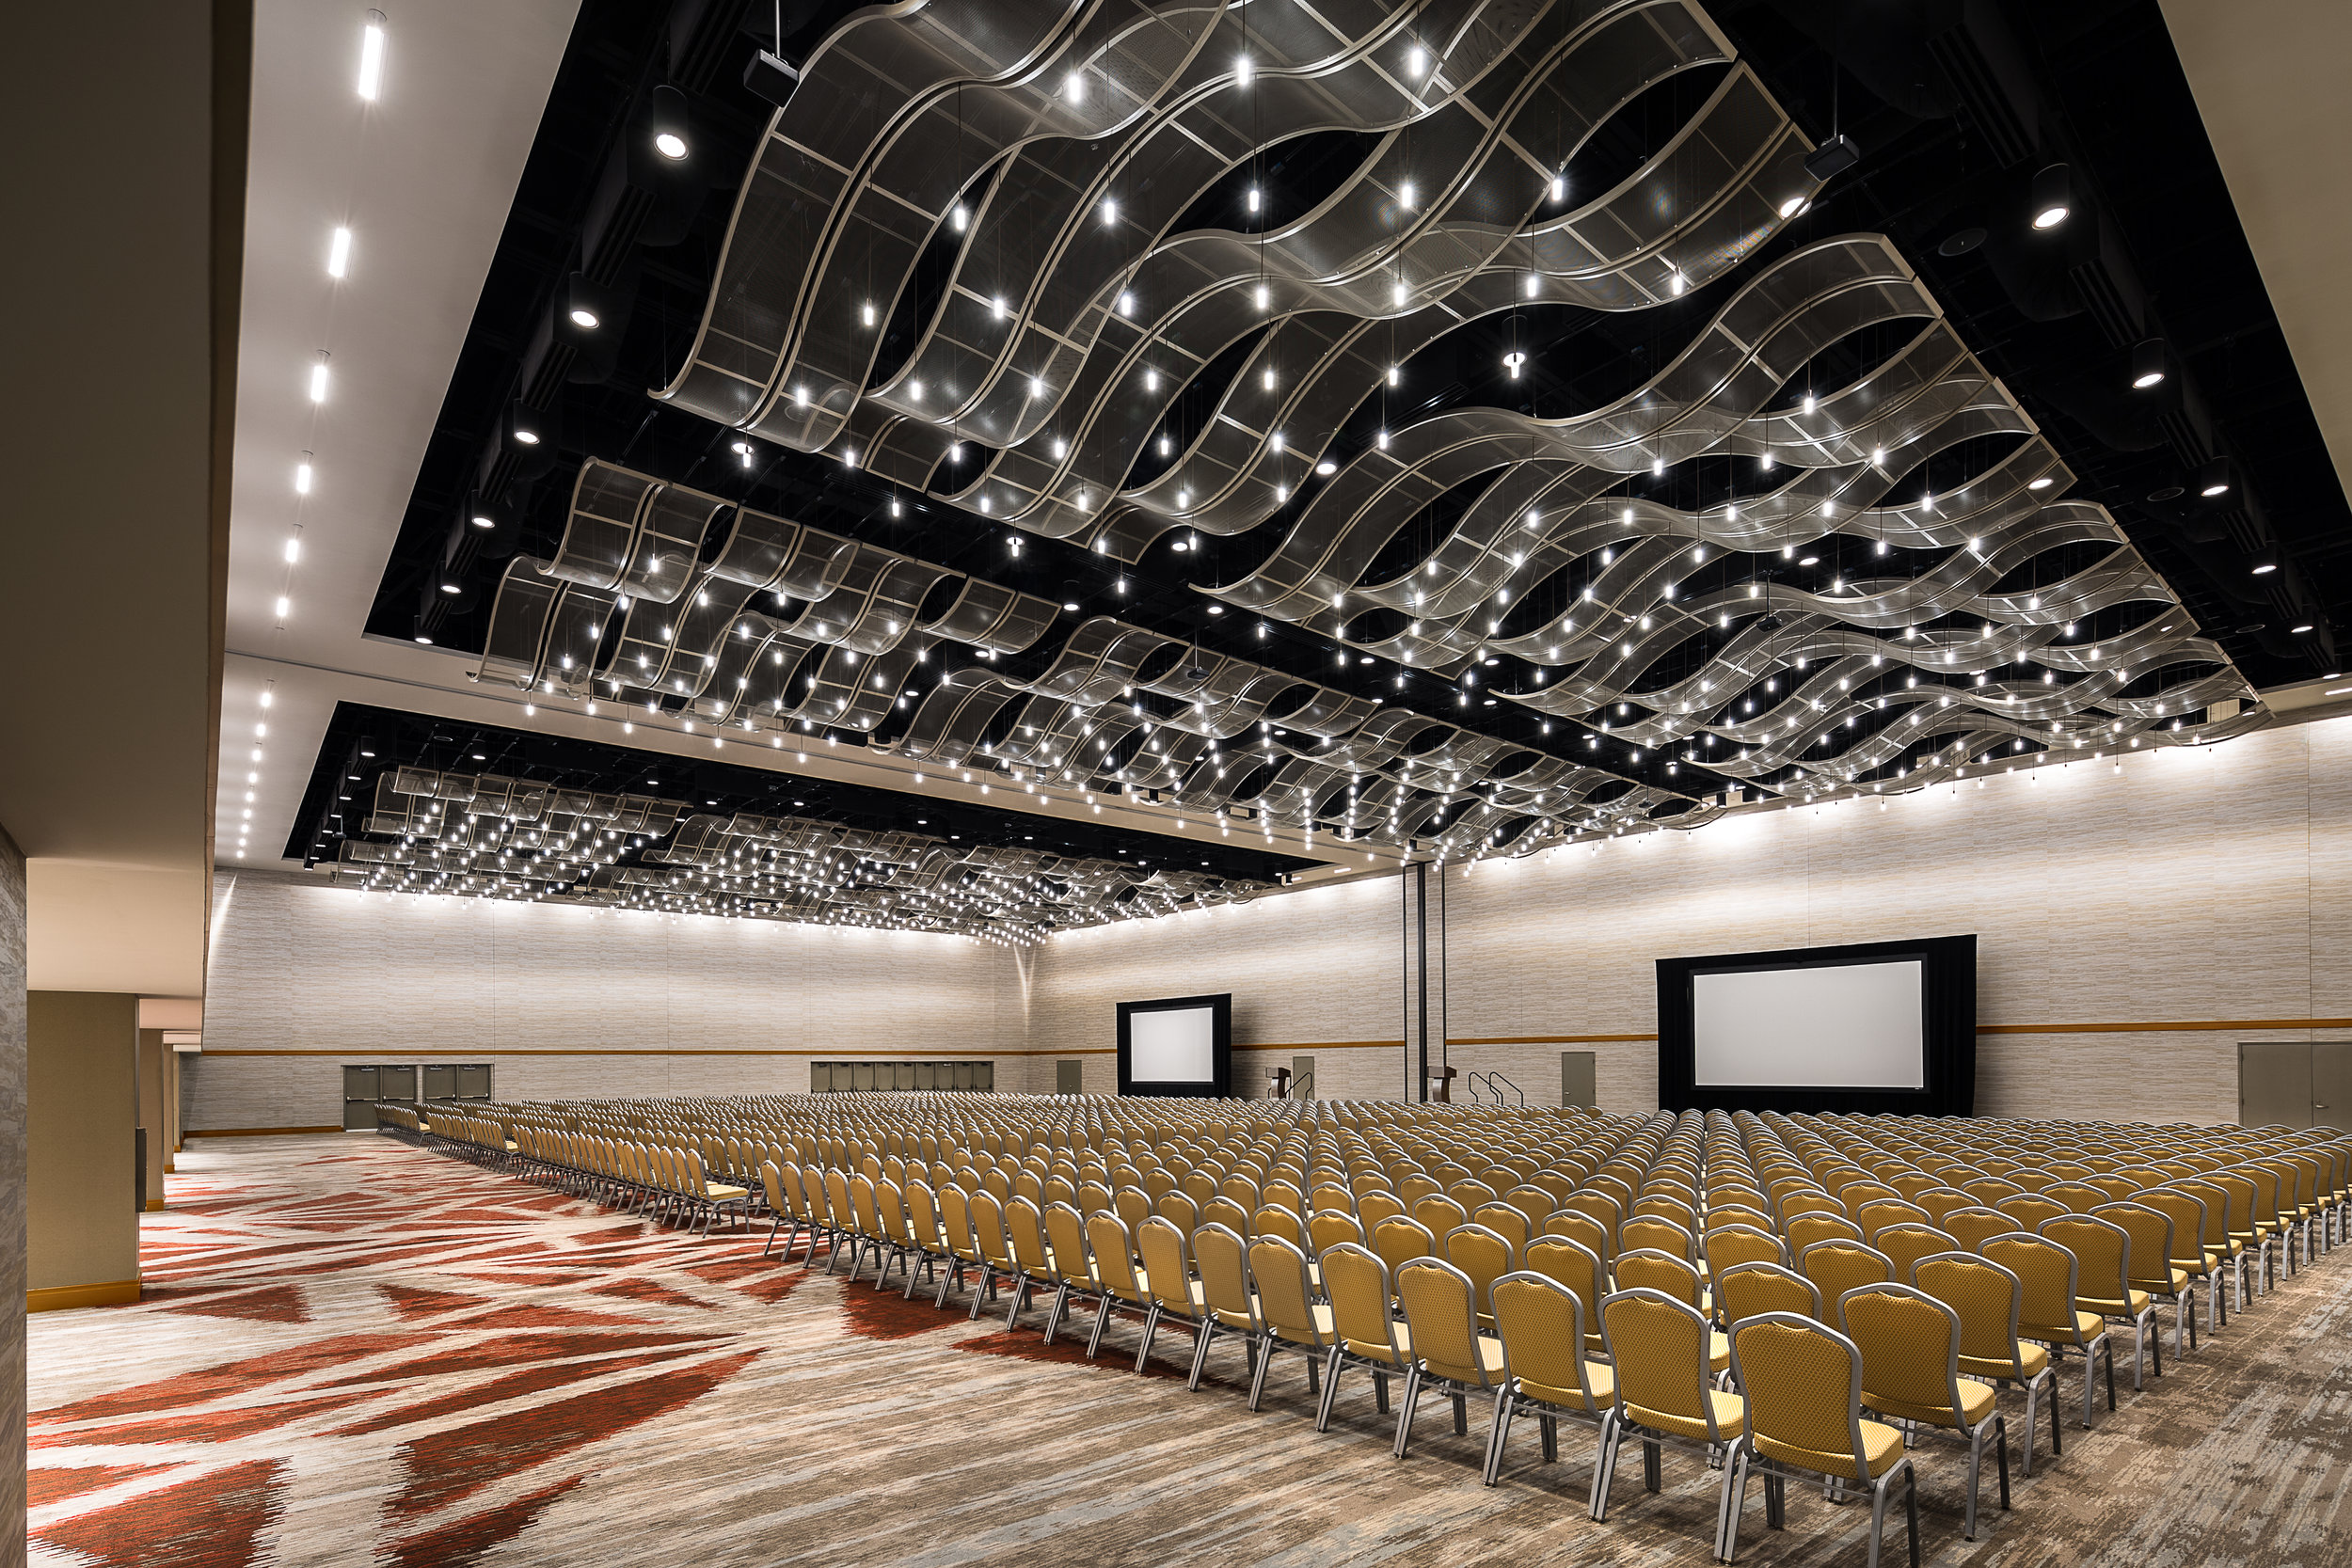 Atlanta Hilton Salon for Lighting Company, Viso, Inc.